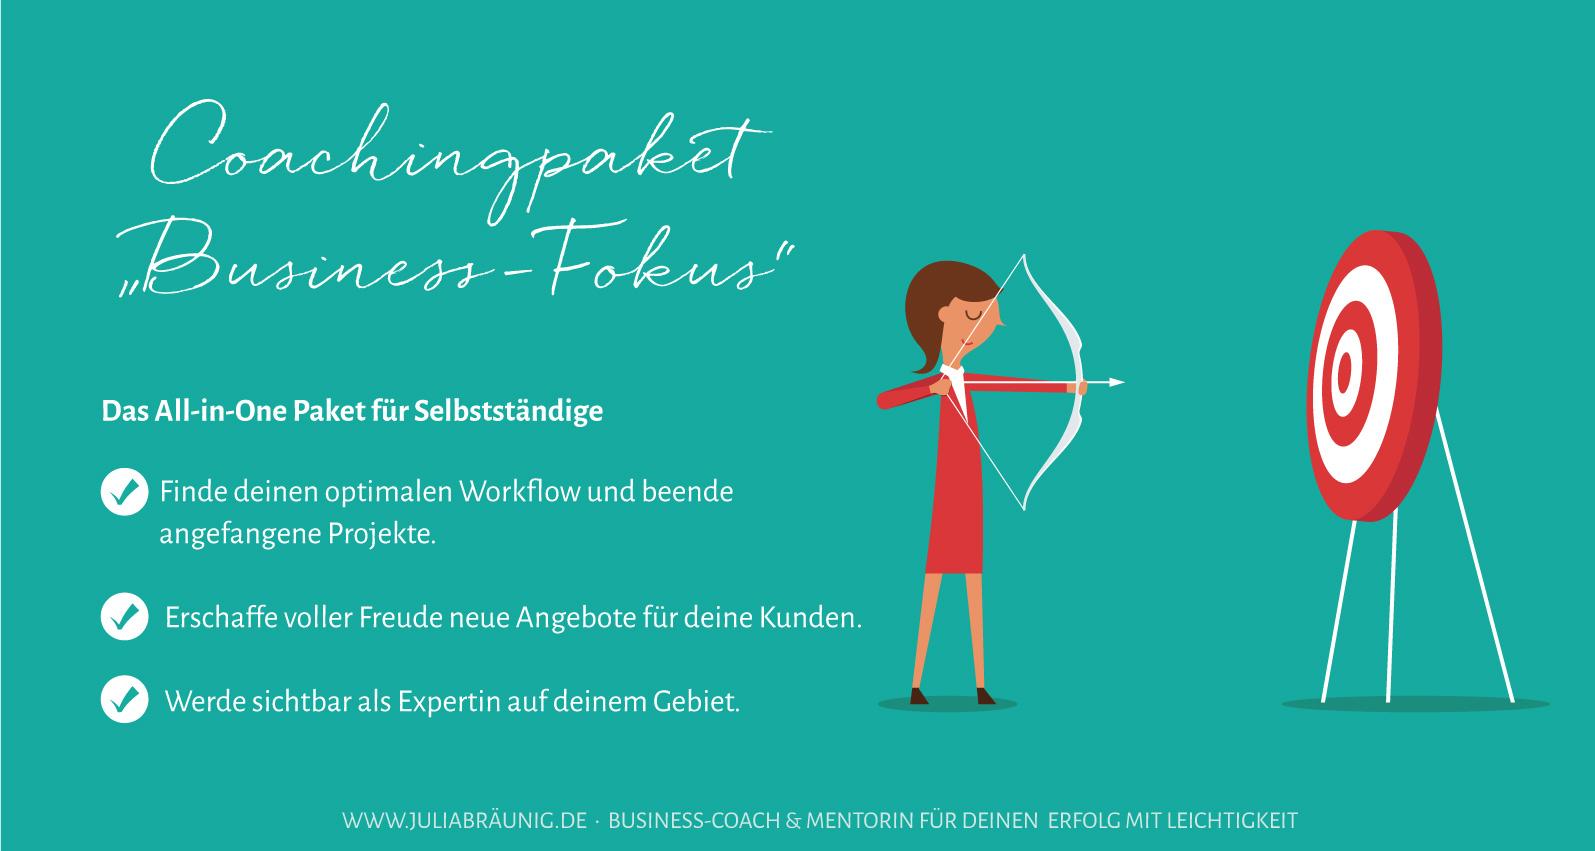 Business-Fokus Business-Coaching